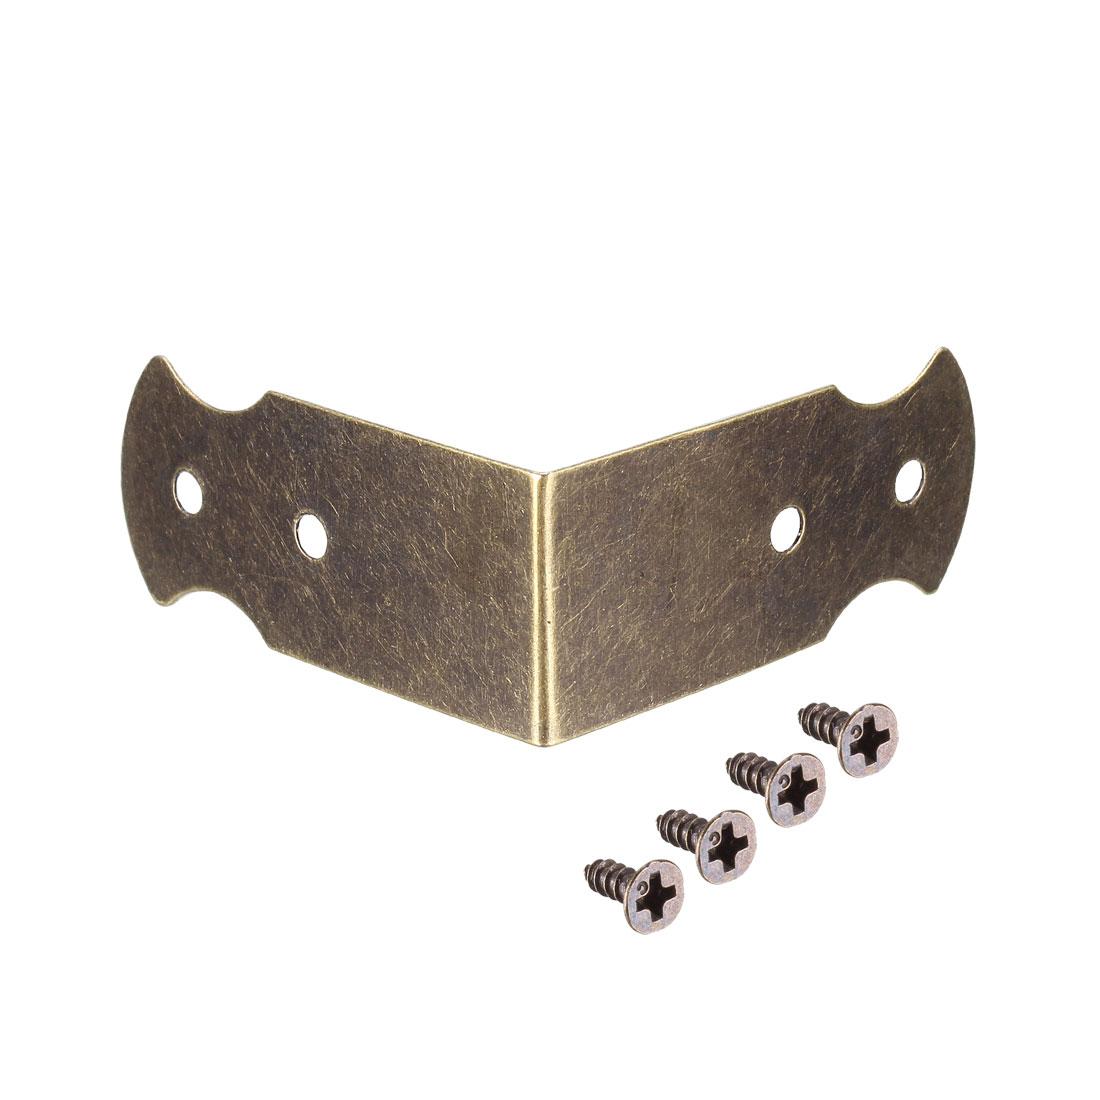 40mmx18mm Vintage Furniture Corner Protector Right Angle Bracket Guard Edge 12Pc